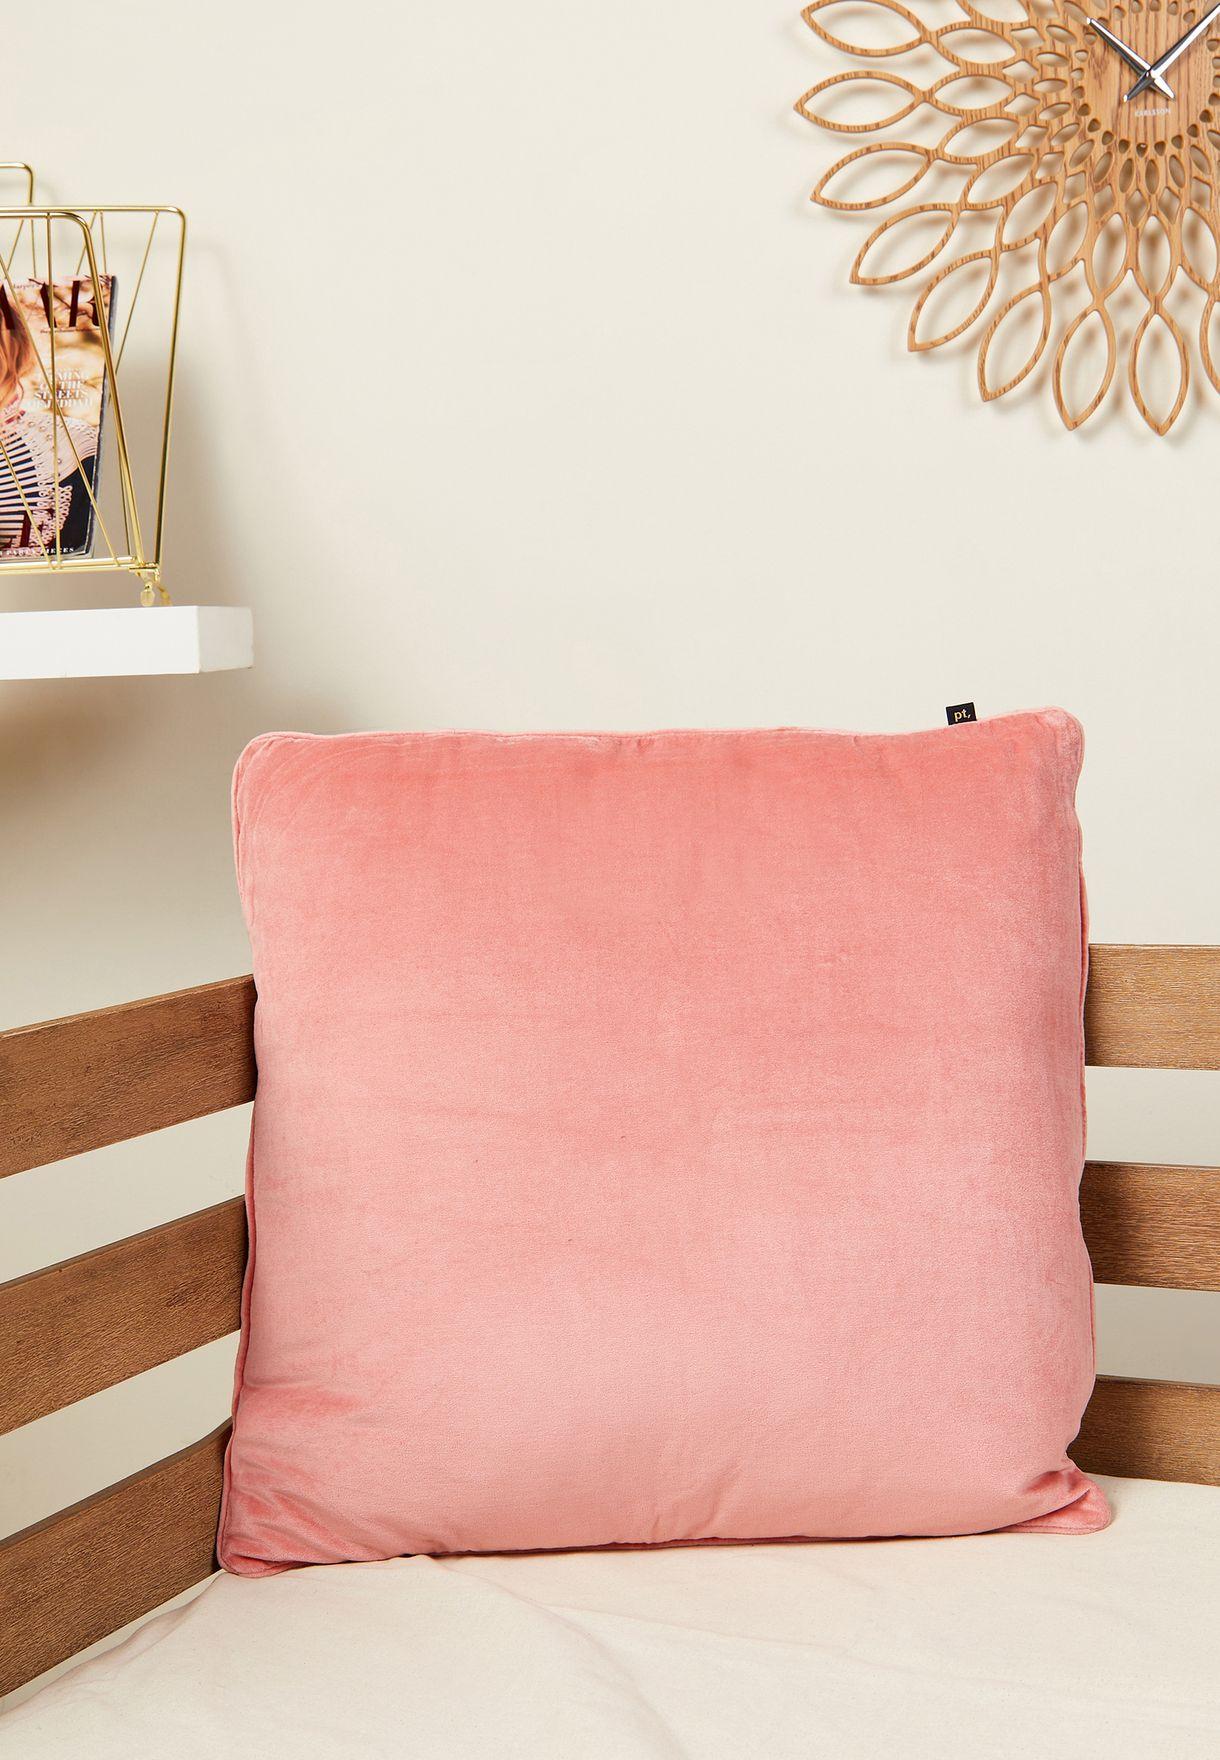 Luxurious XL Velvet Square Cushion